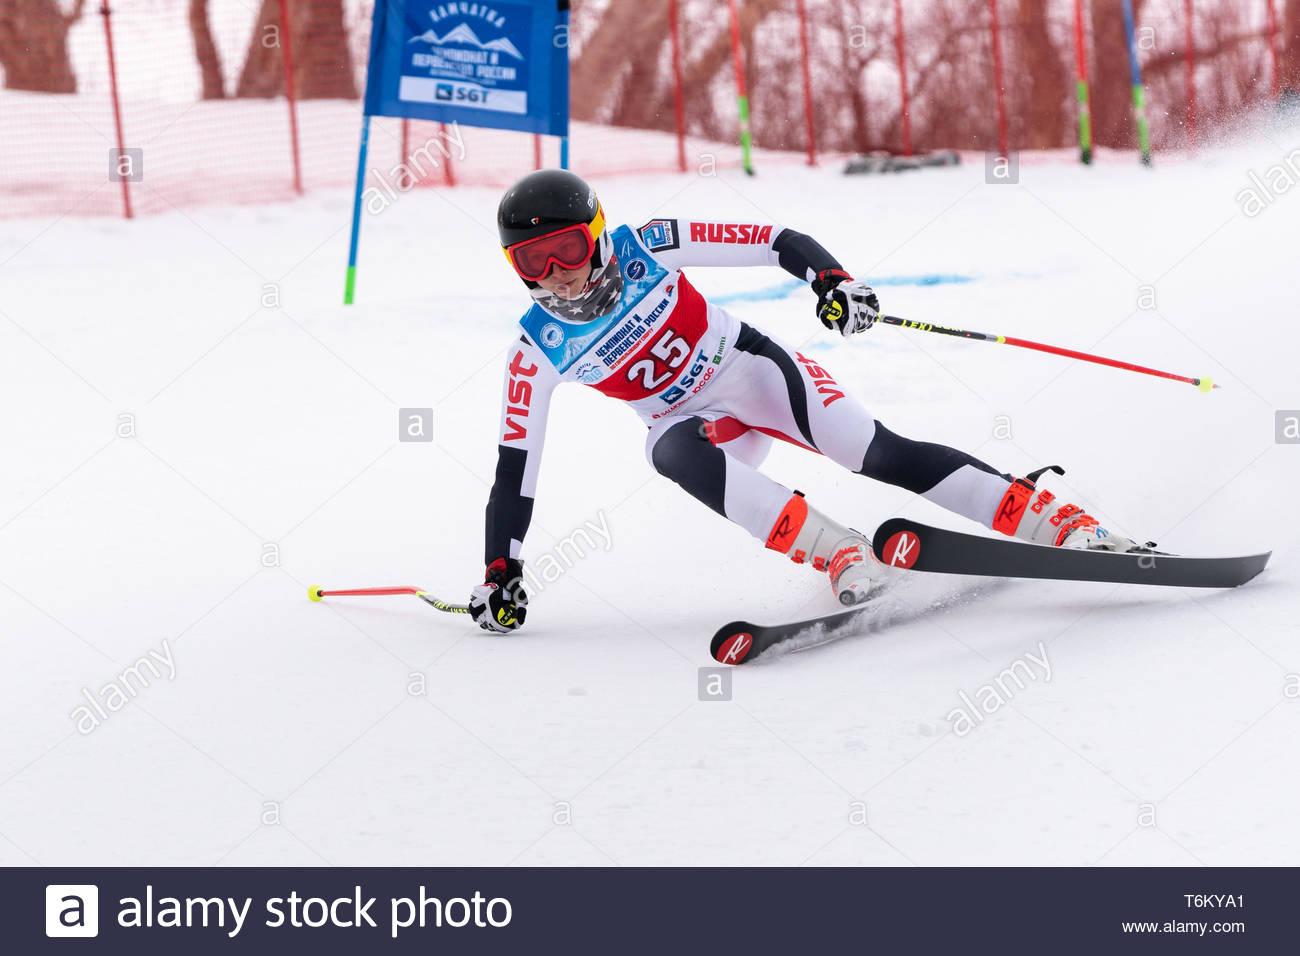 KAMCHATKA PENINSULA, RUSSIA - APRIL 2, 2019: Mountain skier Sautieva Darya (Moscow) skiing down mount slope. Russian Women's Alpine Skiing Cup, Intern - Stock Image